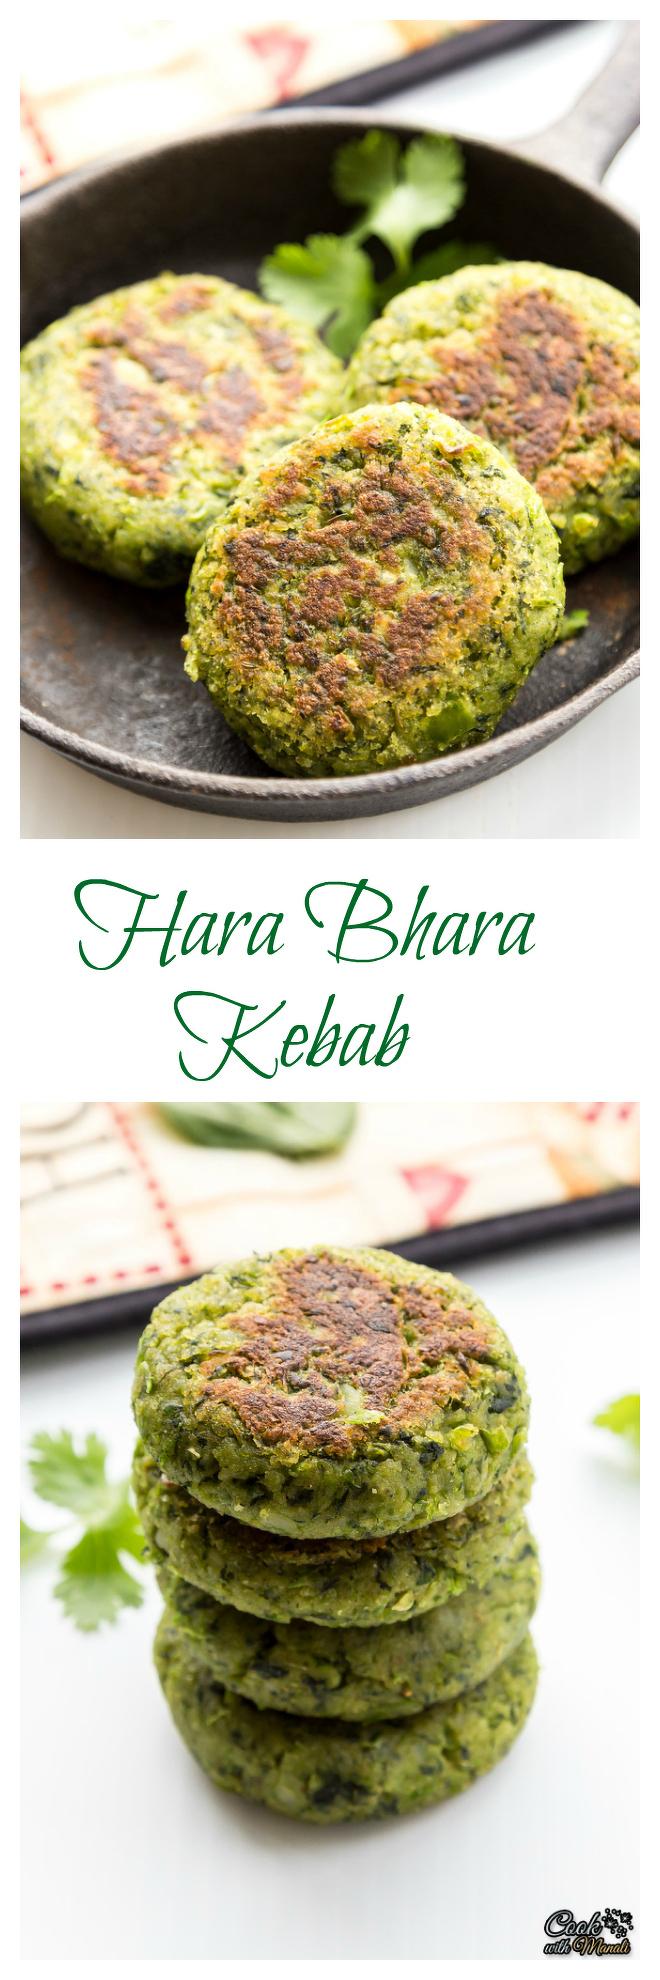 Hara-Bhara-Kebab-Collage-nocwm